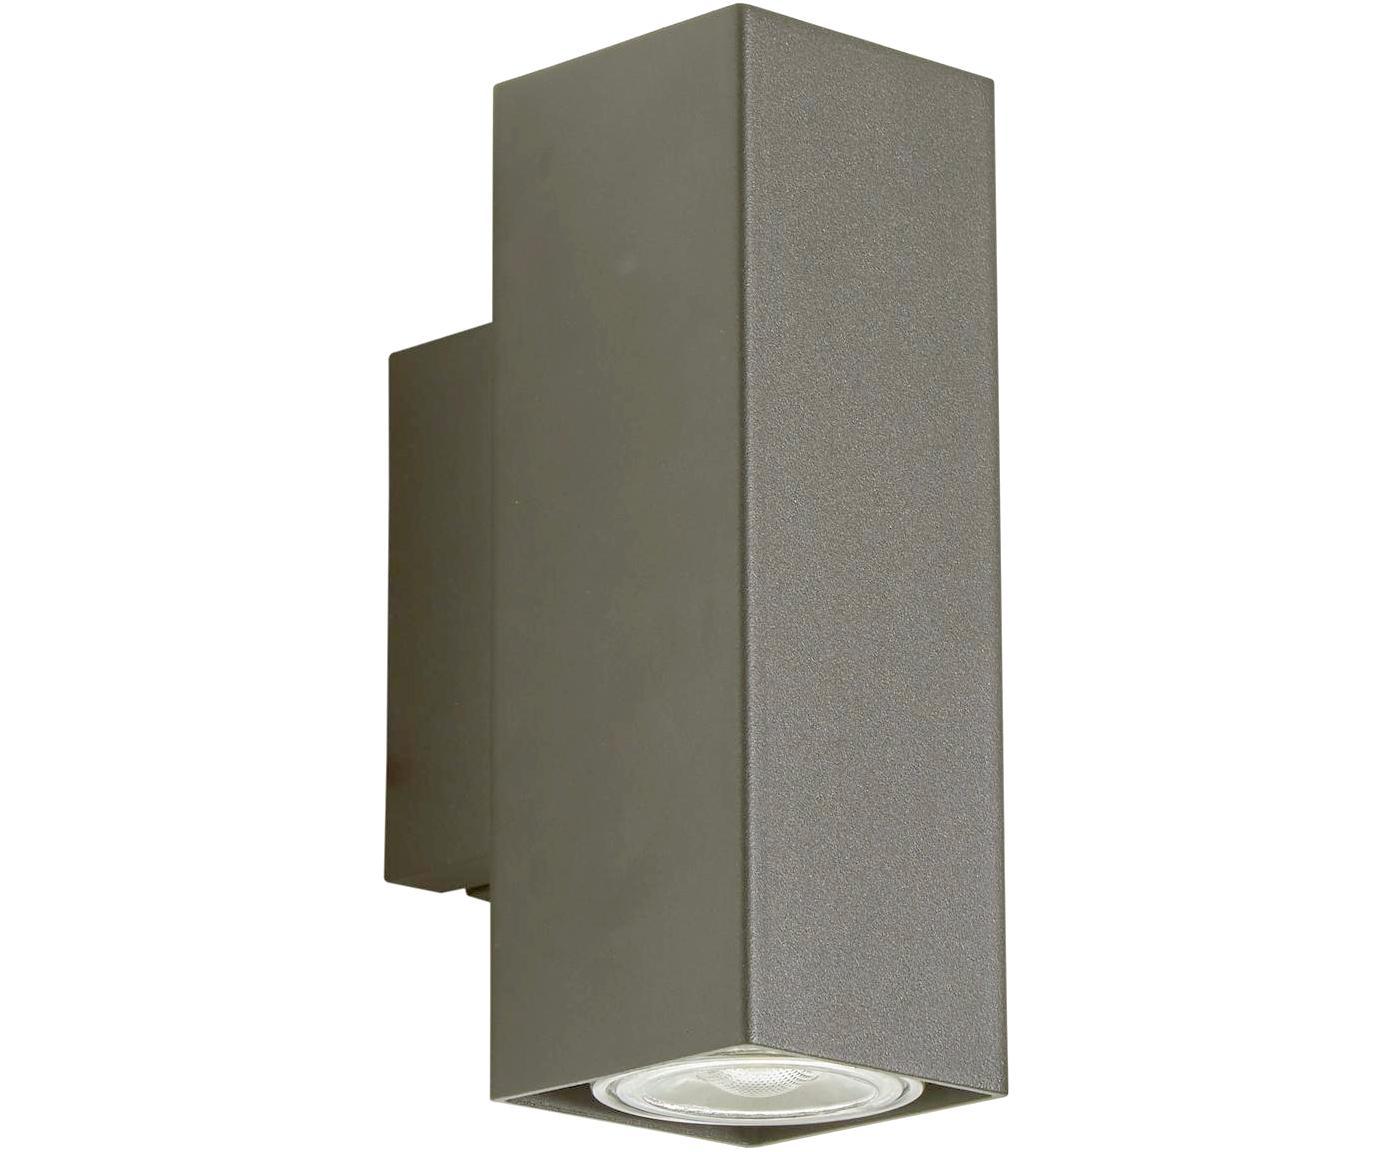 Aplique LED Peter, Metal, cromado, Cromo, An 5 x Al 8 cm